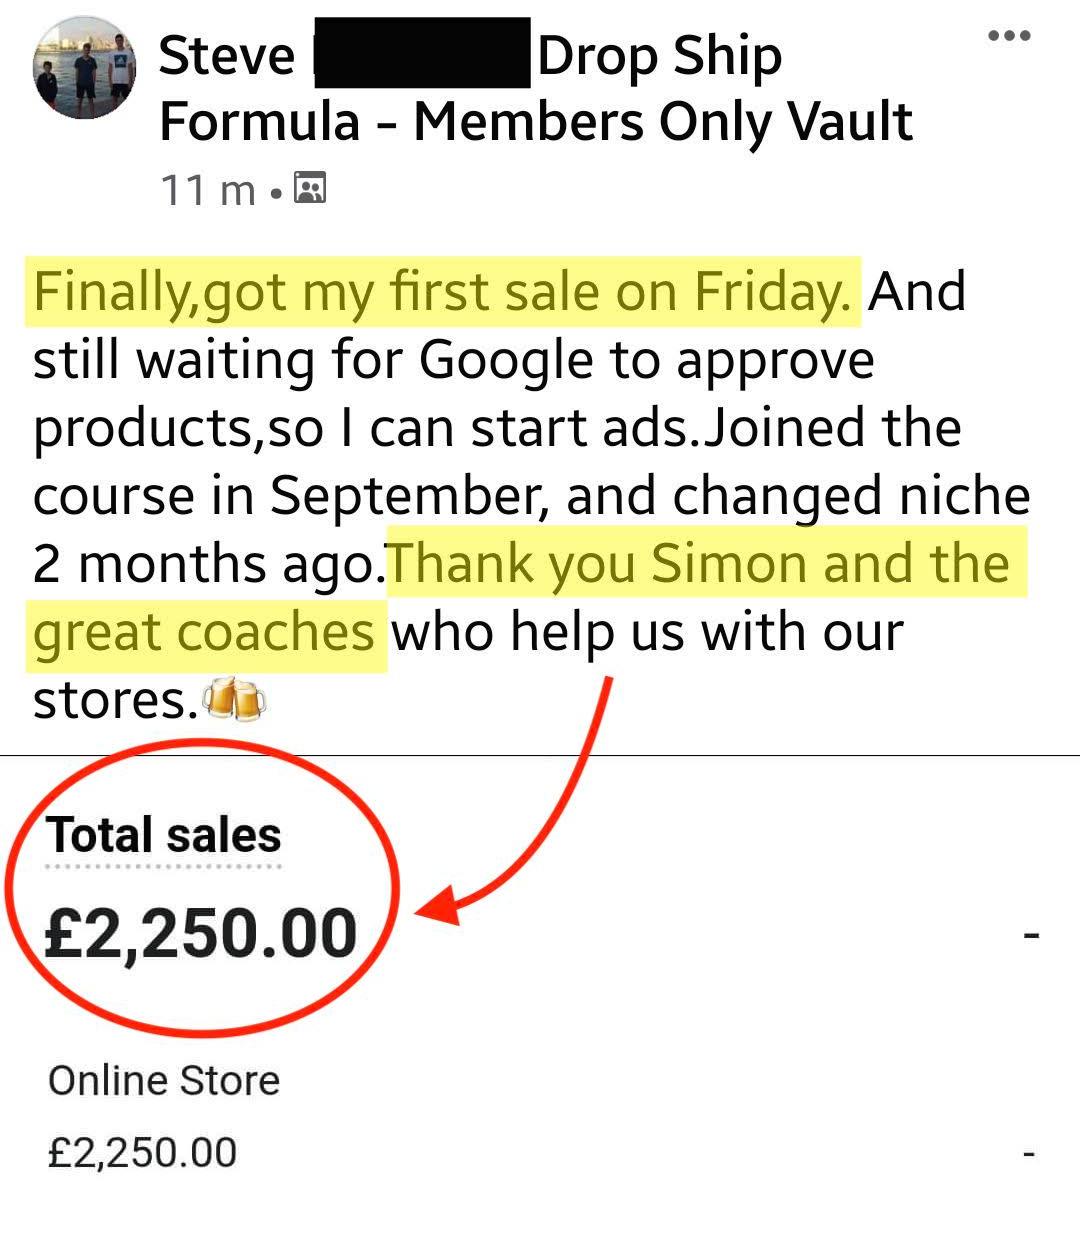 Steve First Sale Drop Ship Formula